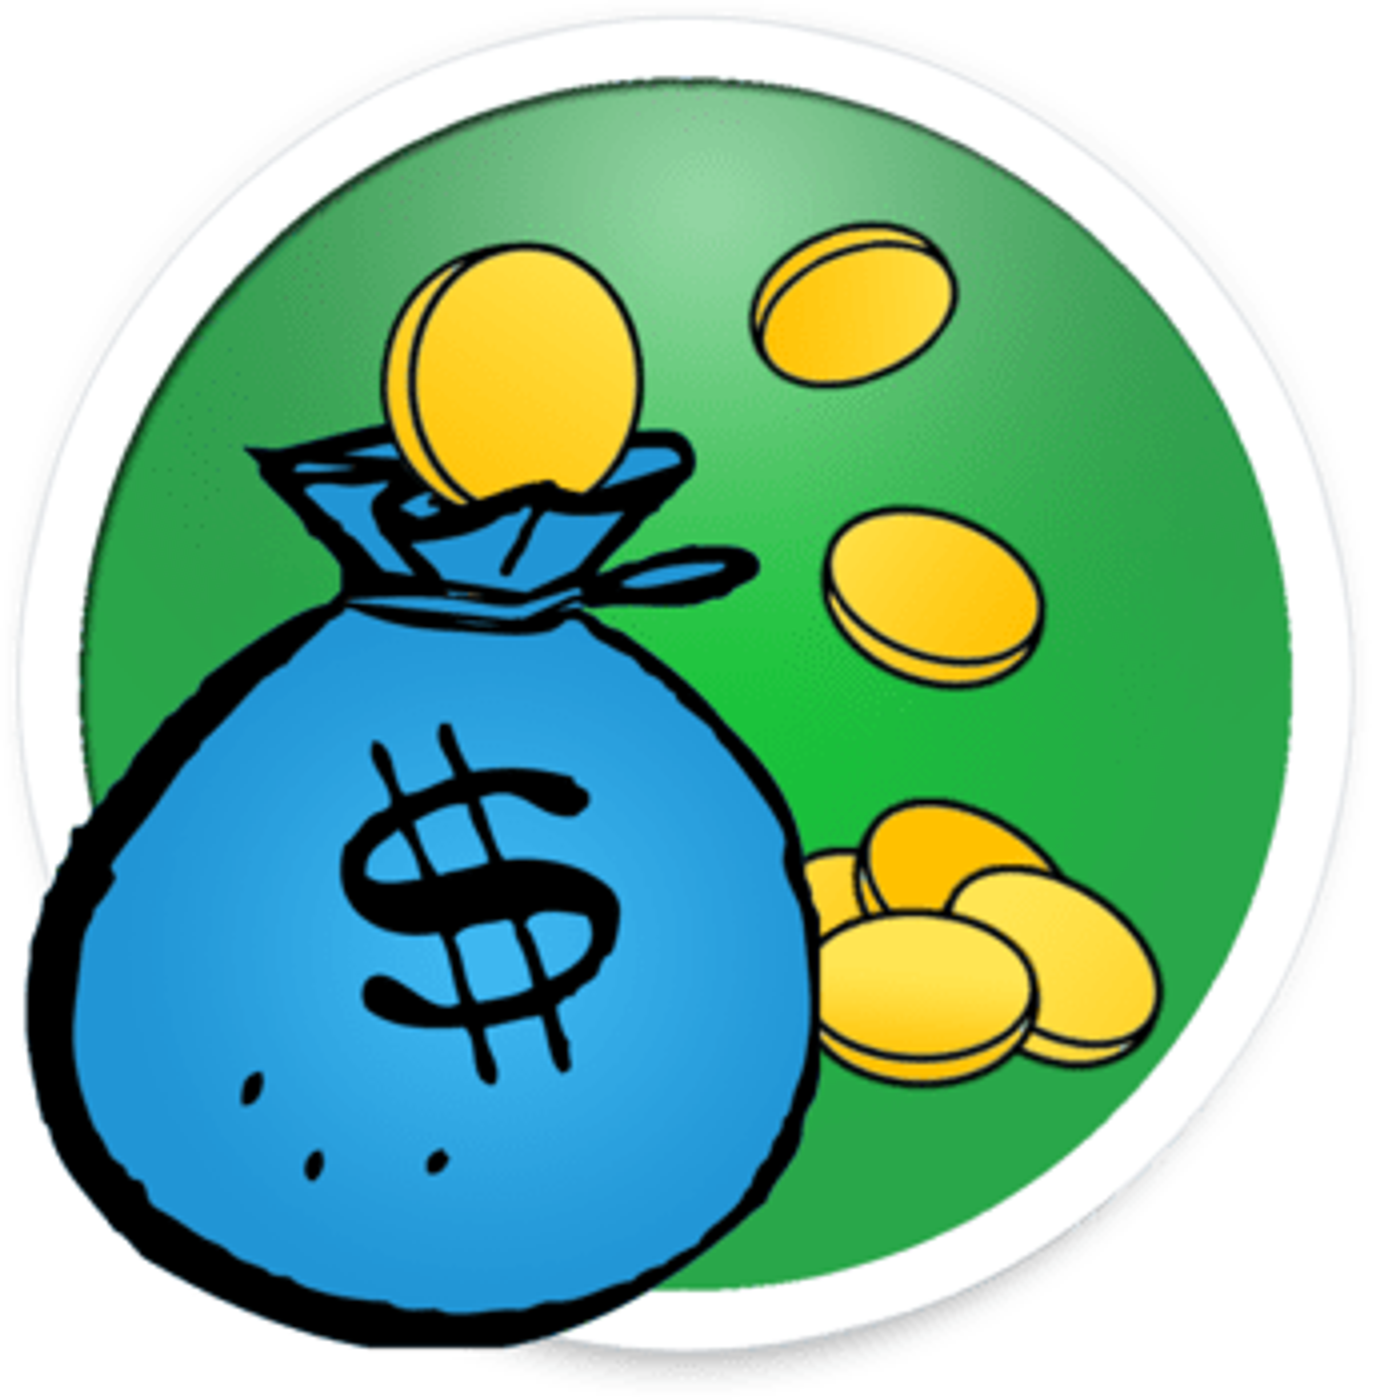 Finanze 0.6.1